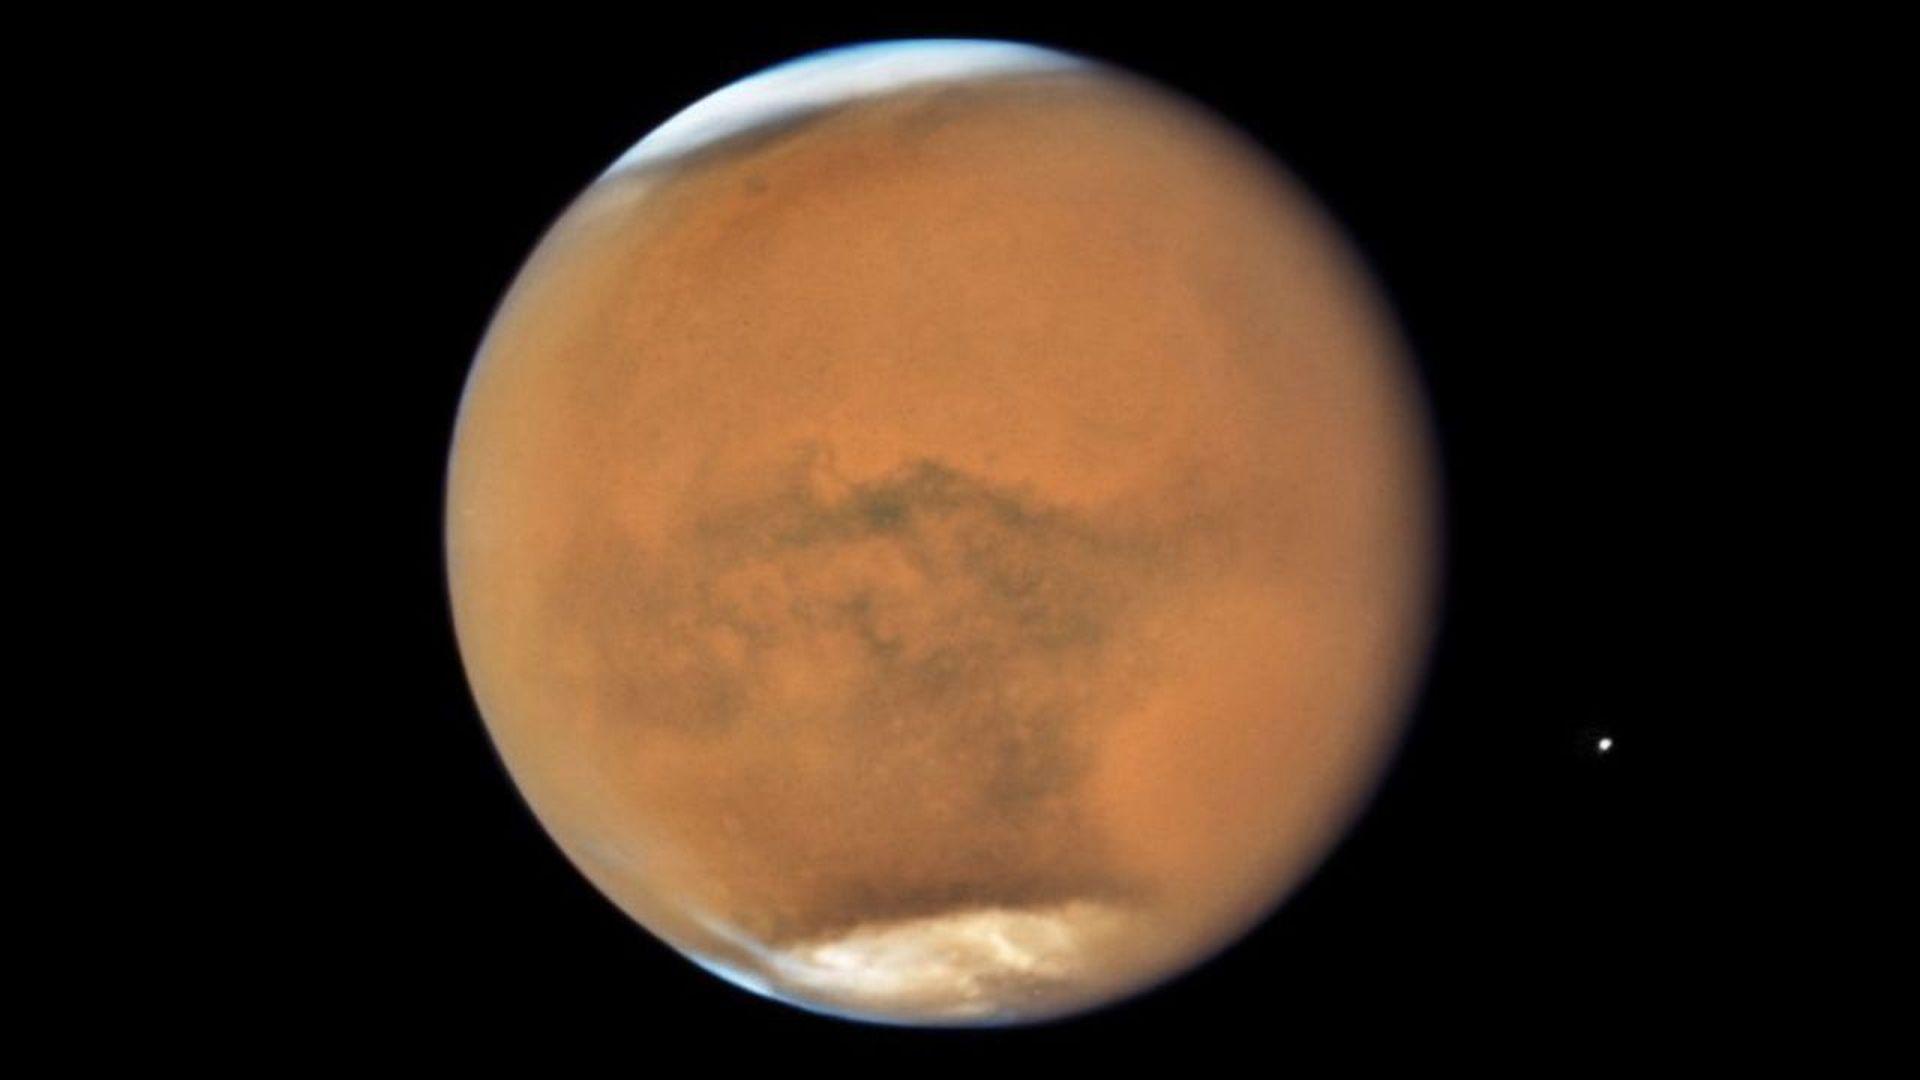 Mars seen in 2018. Photo: NASA/ESA/STScI